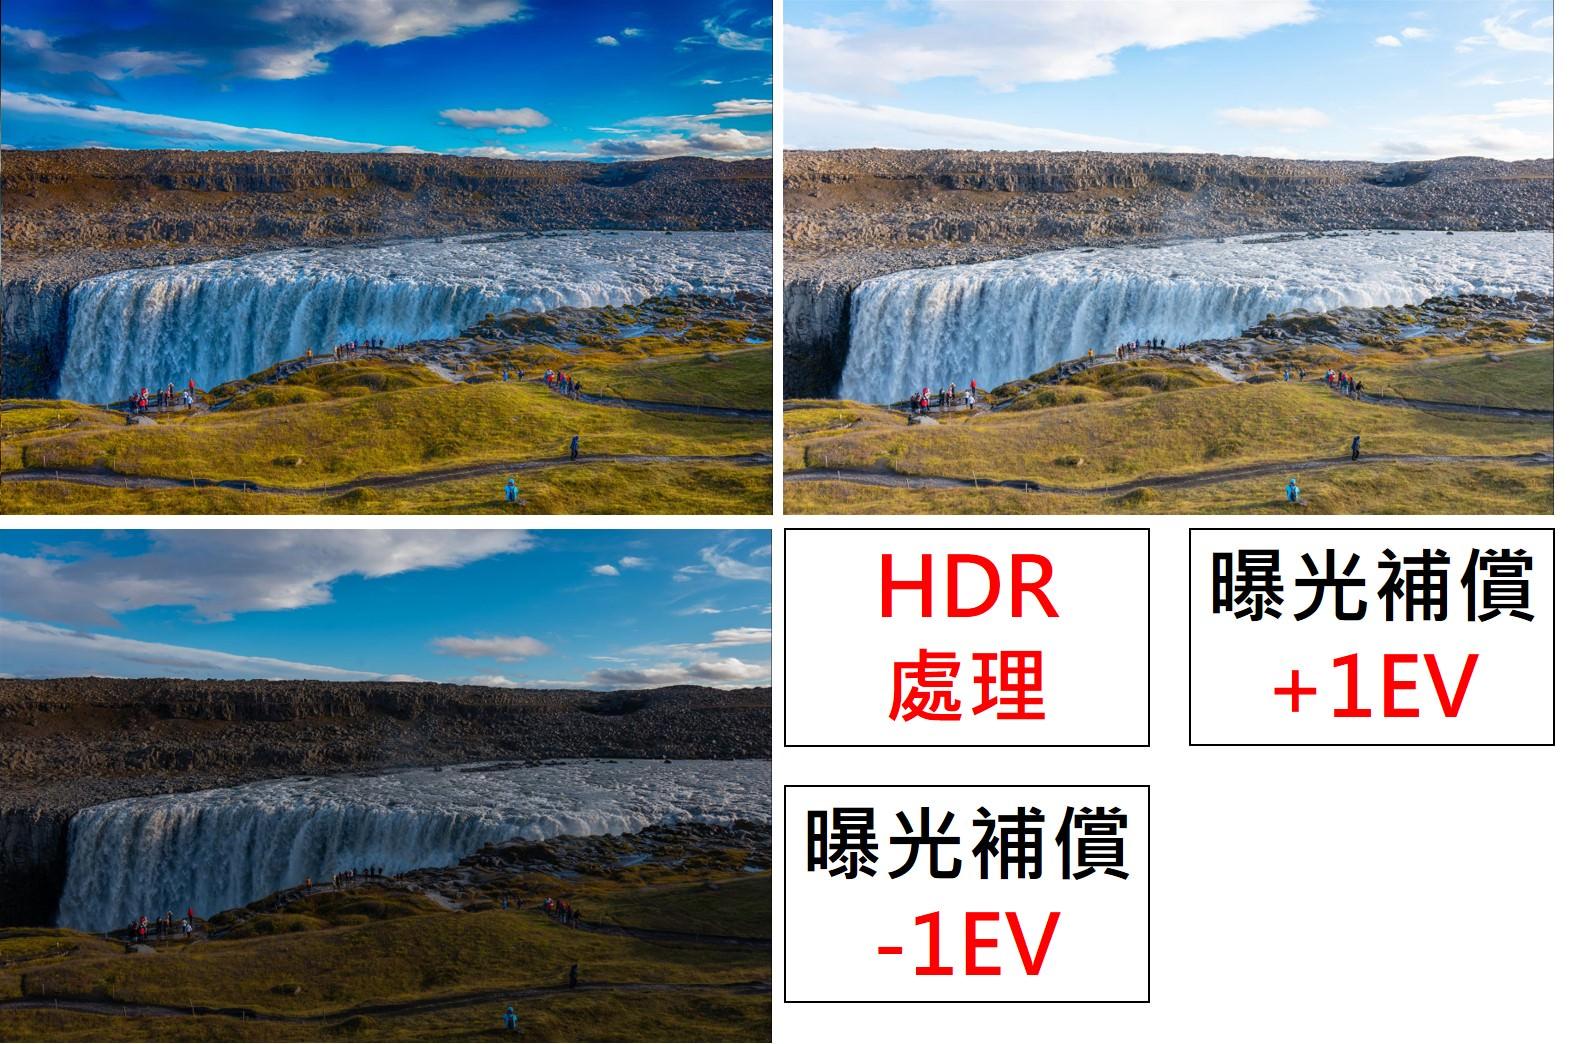 什麼是 HDR